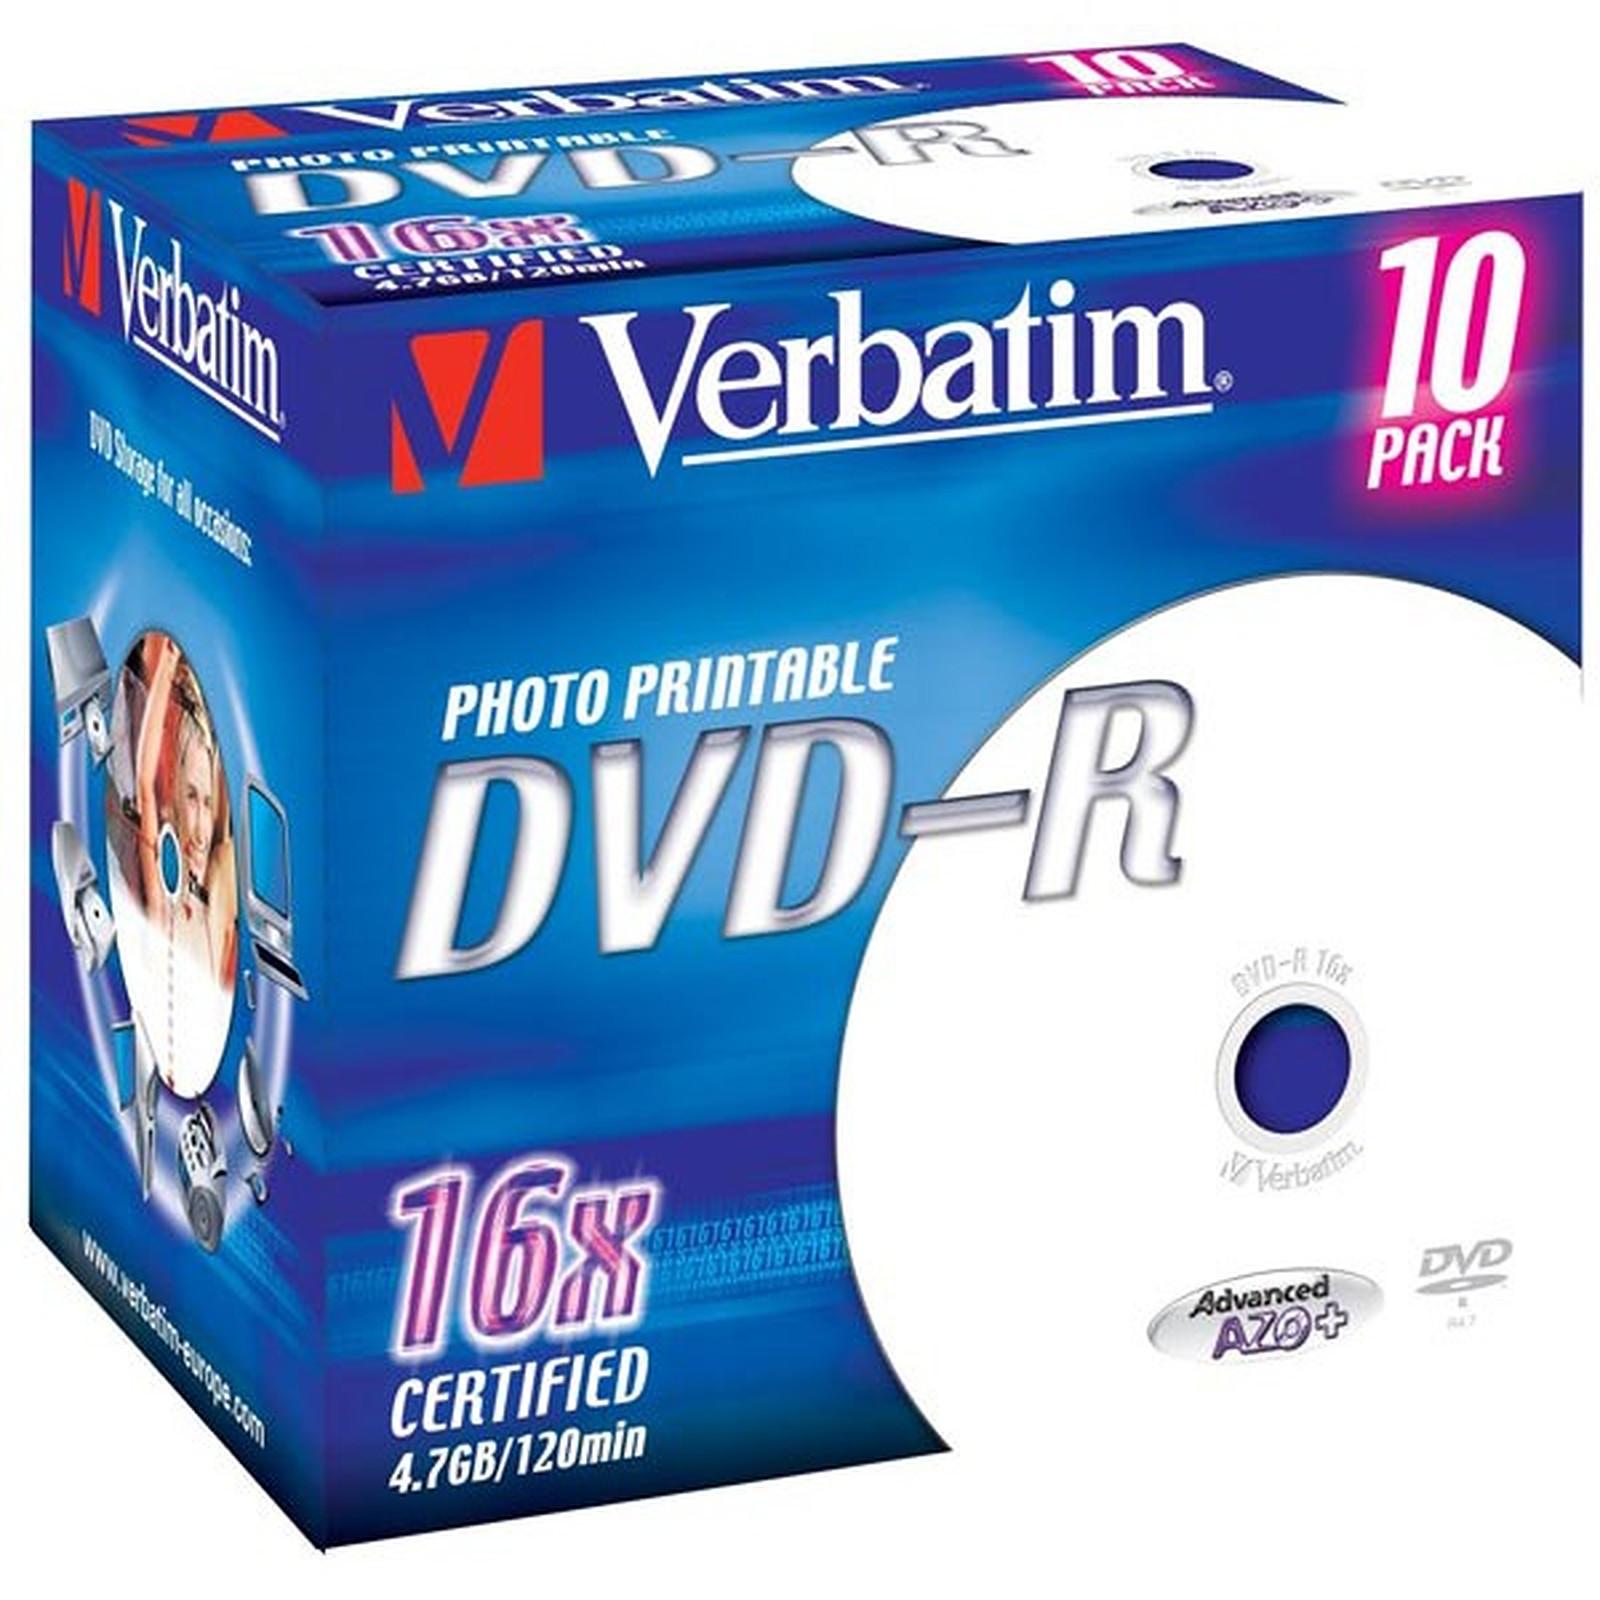 Verbatim DVD-R 4.7 Go 16x imprimable (par 10, boite)